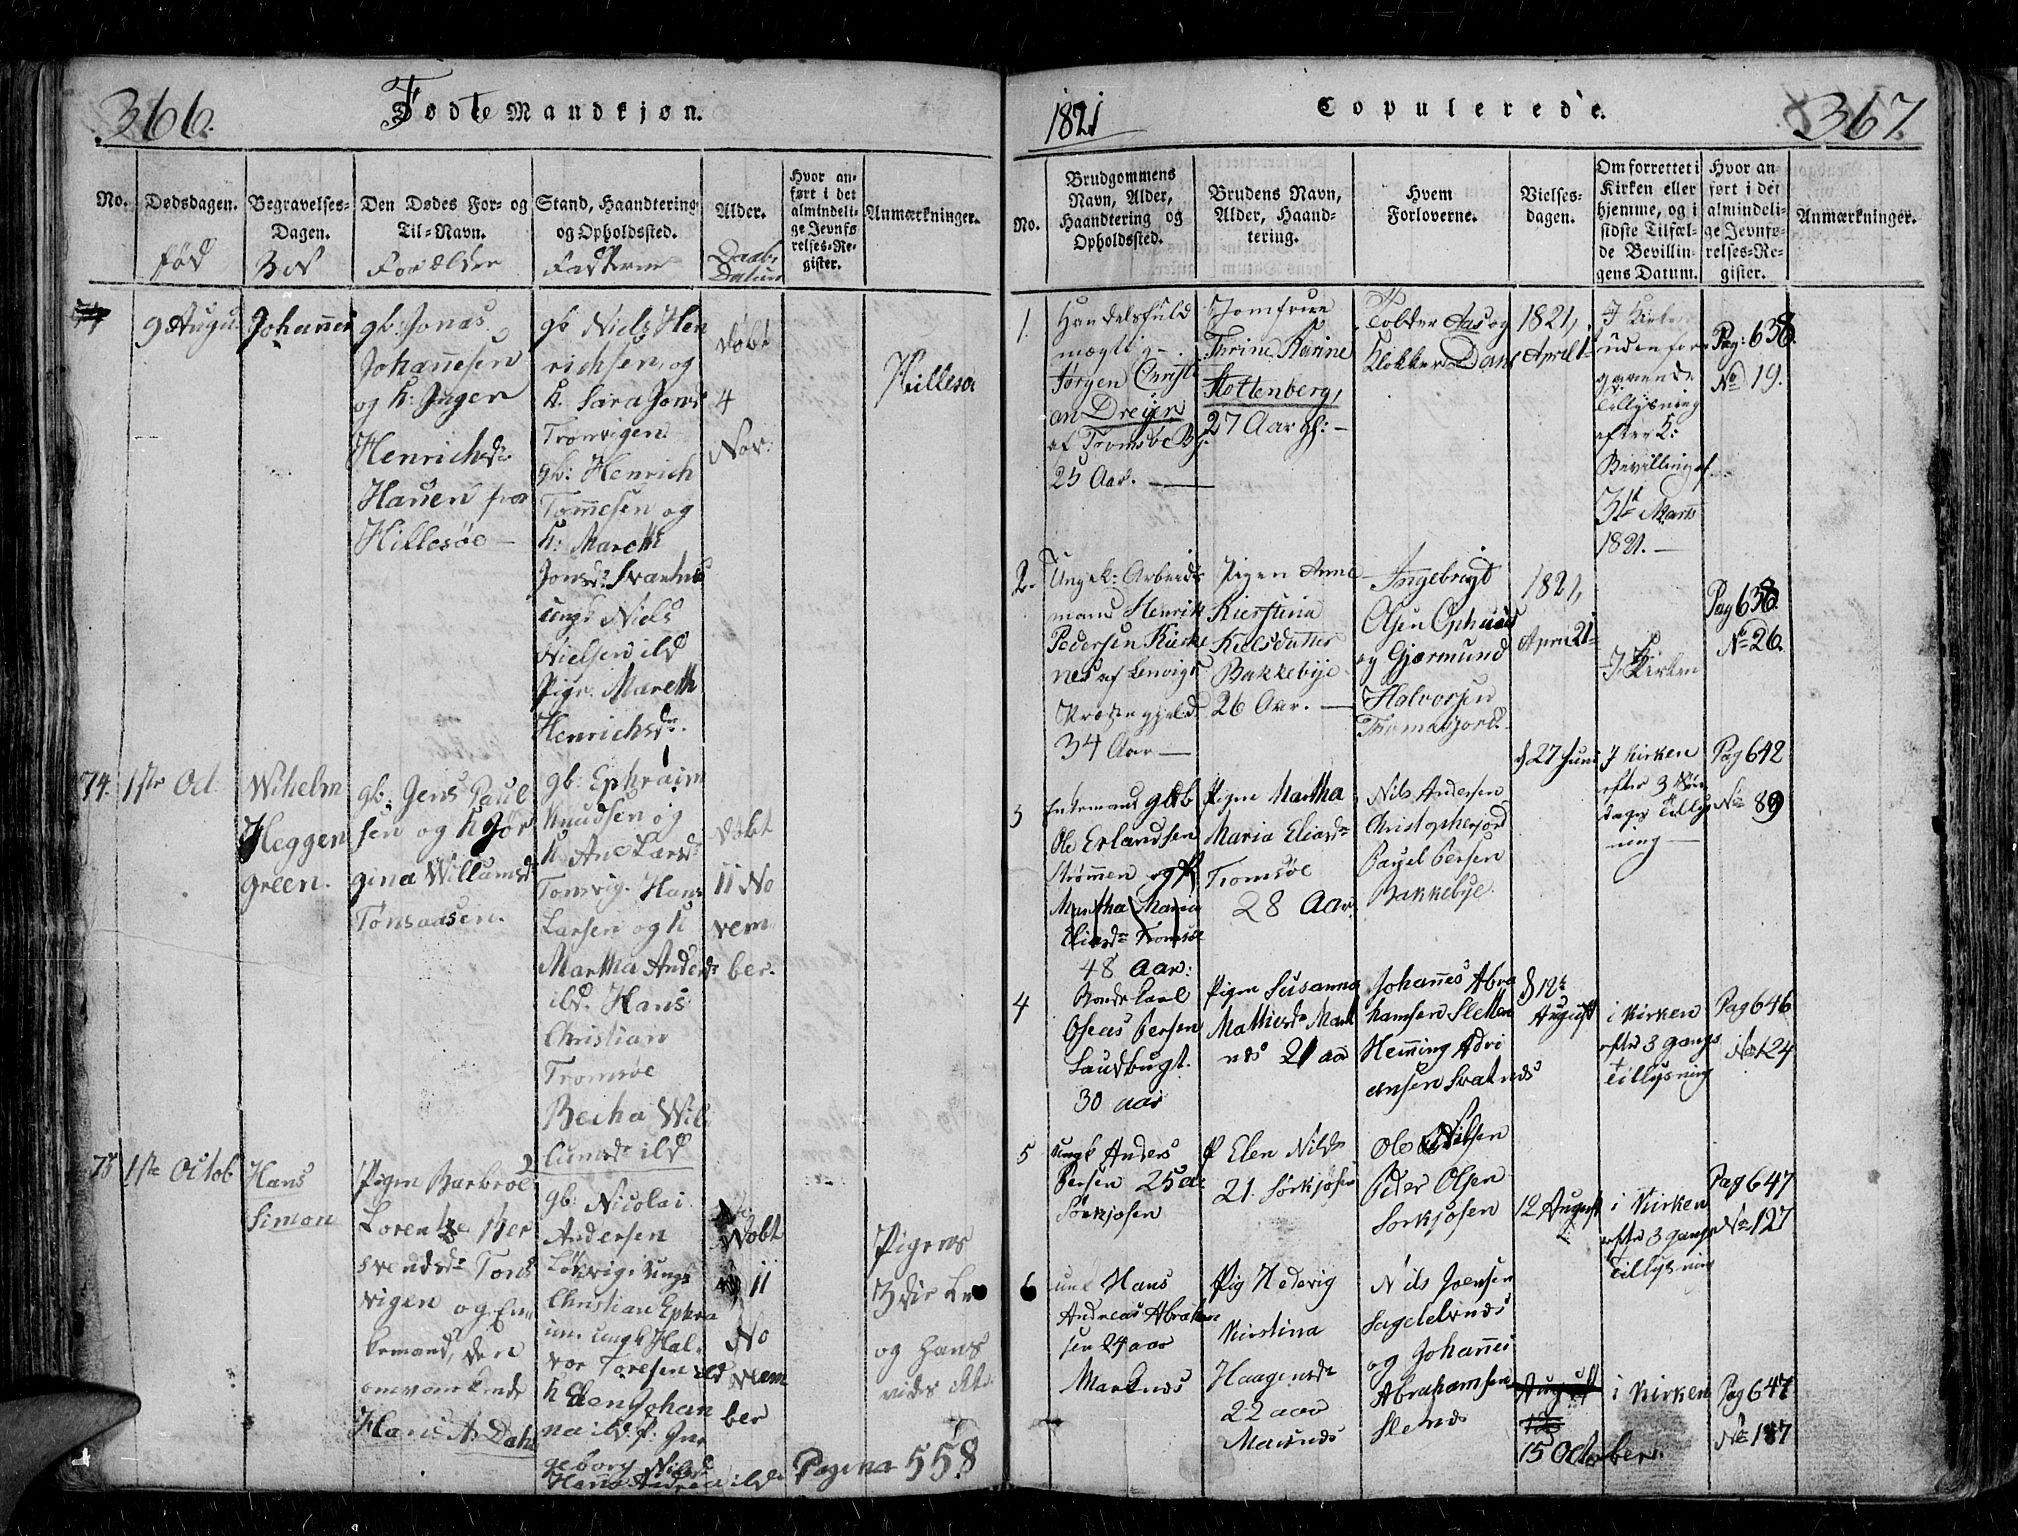 SATØ, Tromsø sokneprestkontor/stiftsprosti/domprosti, G/Gb/L0001klokker: Klokkerbok nr. 1, 1821-1833, s. 366-367